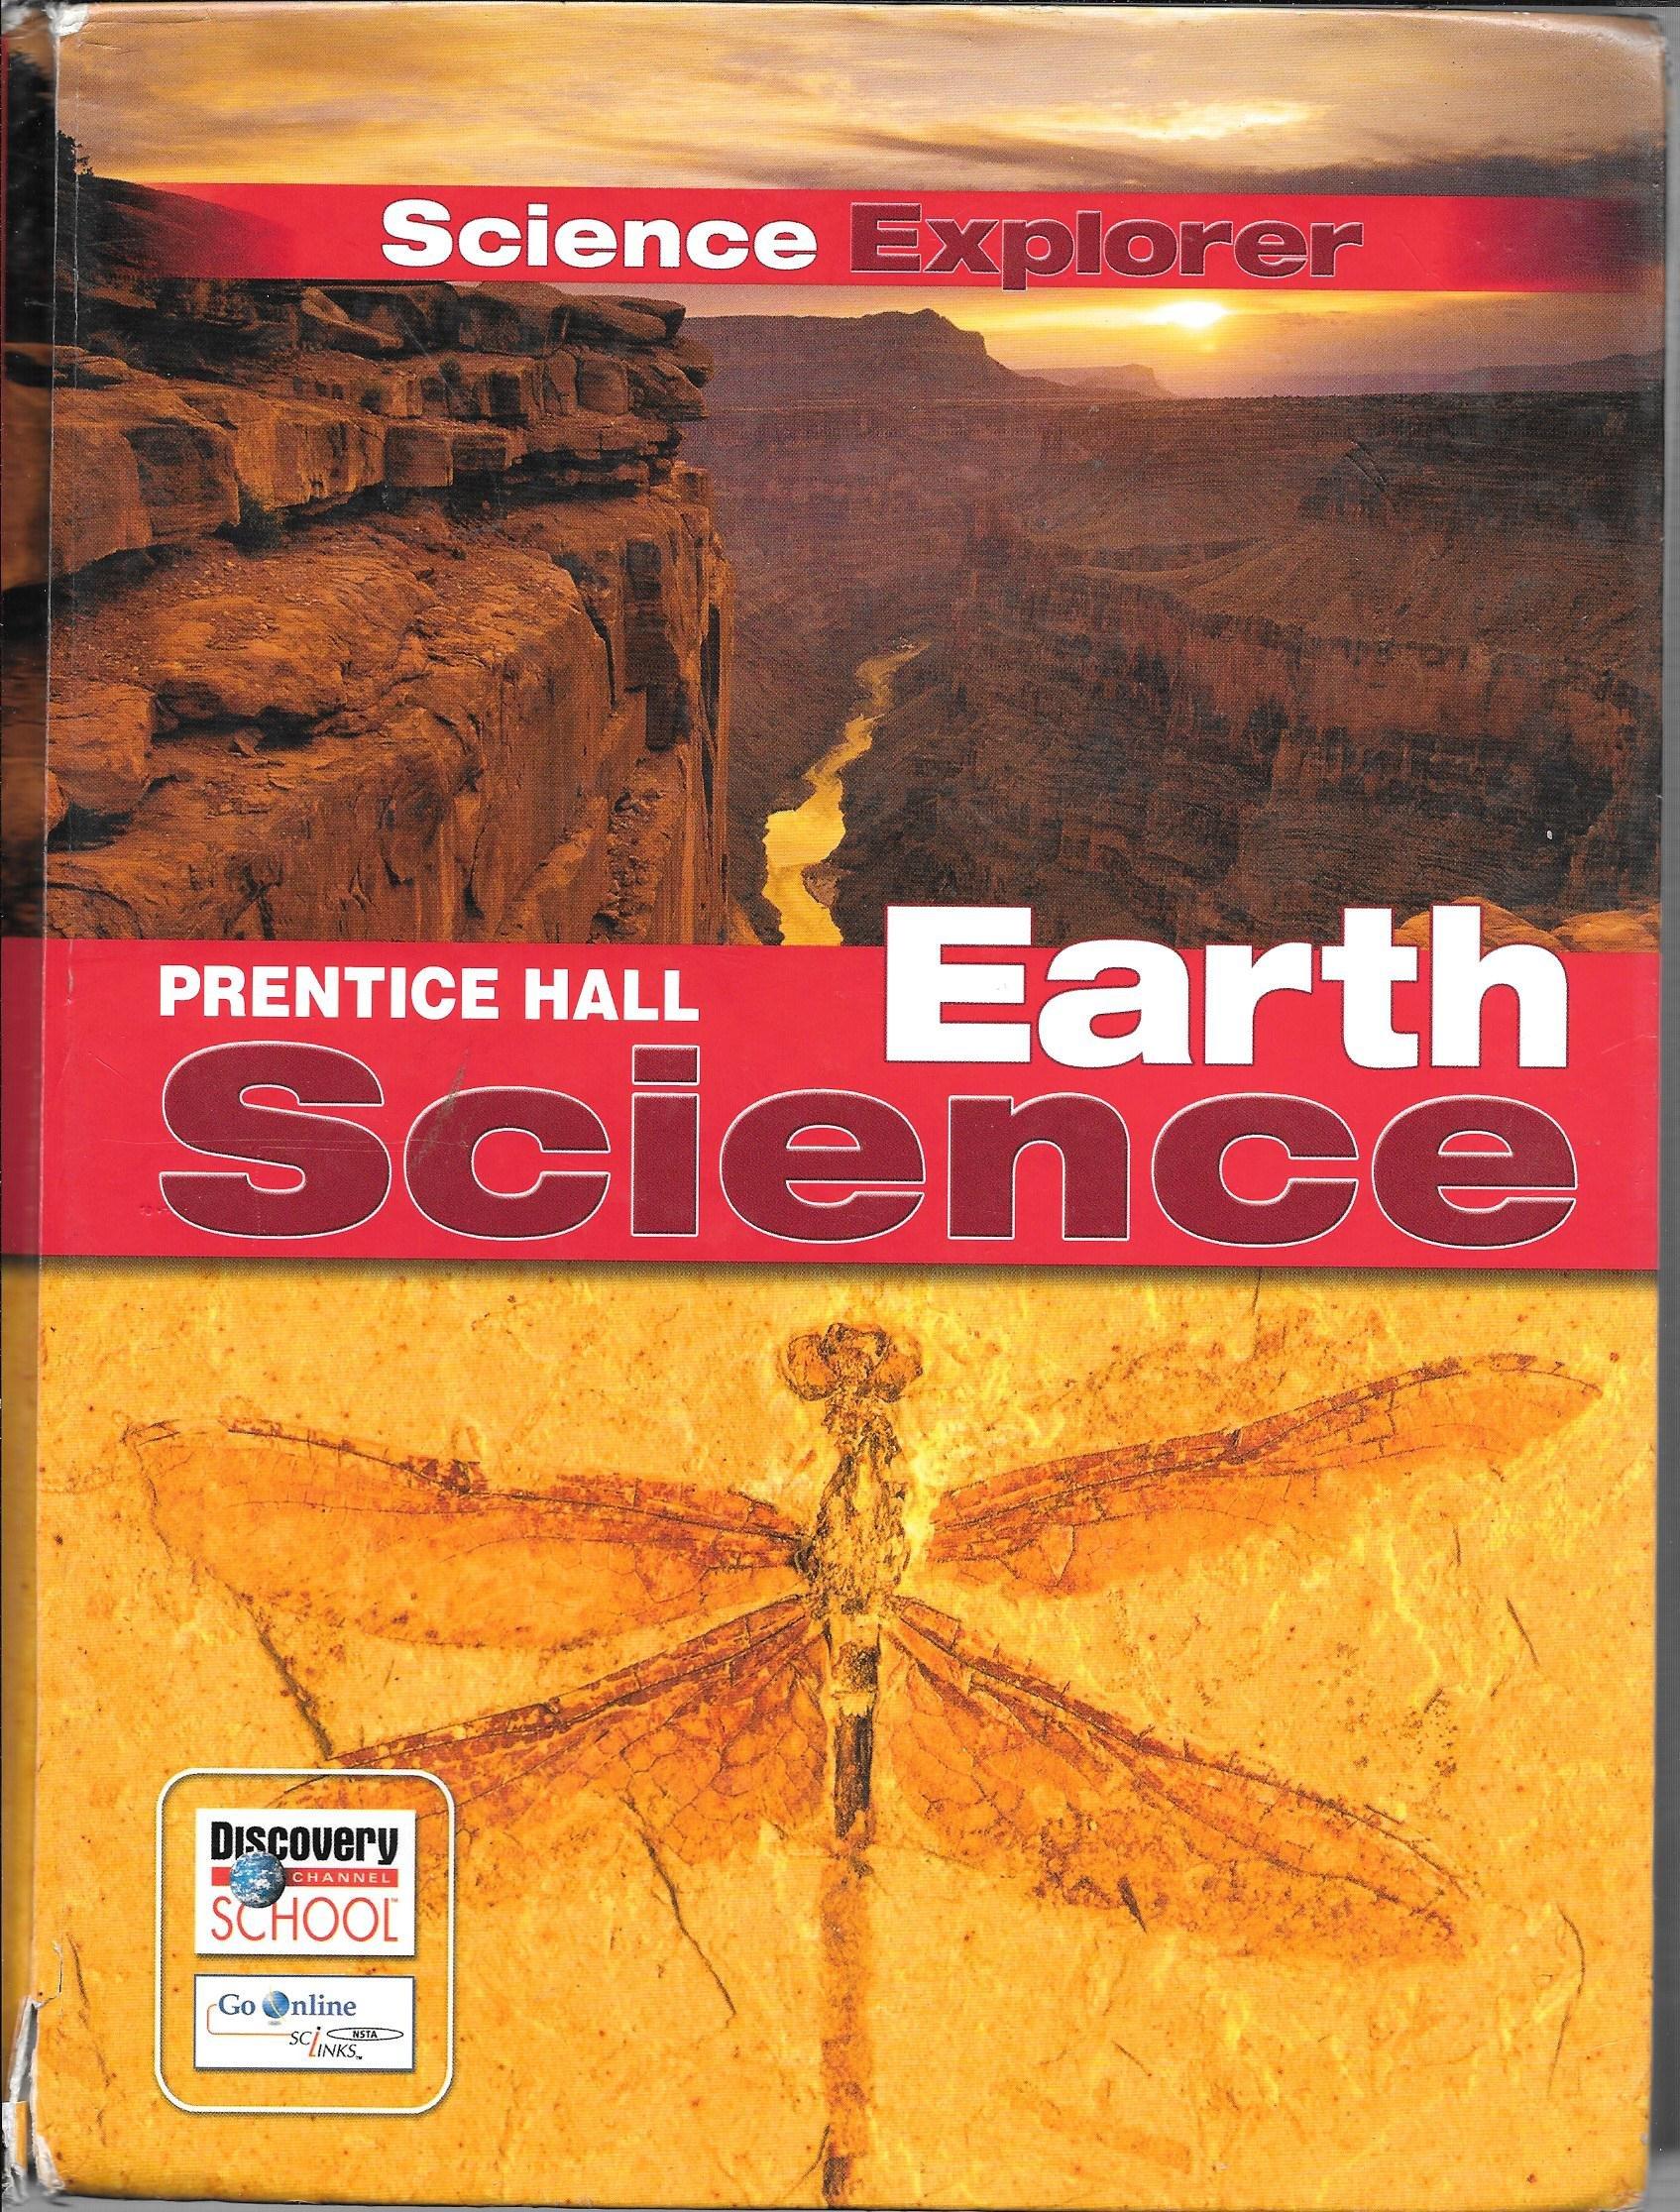 PRENTICE HALL SCIENCE EXPLORER EARTH SCIENCE STUDENT EDITION 2005